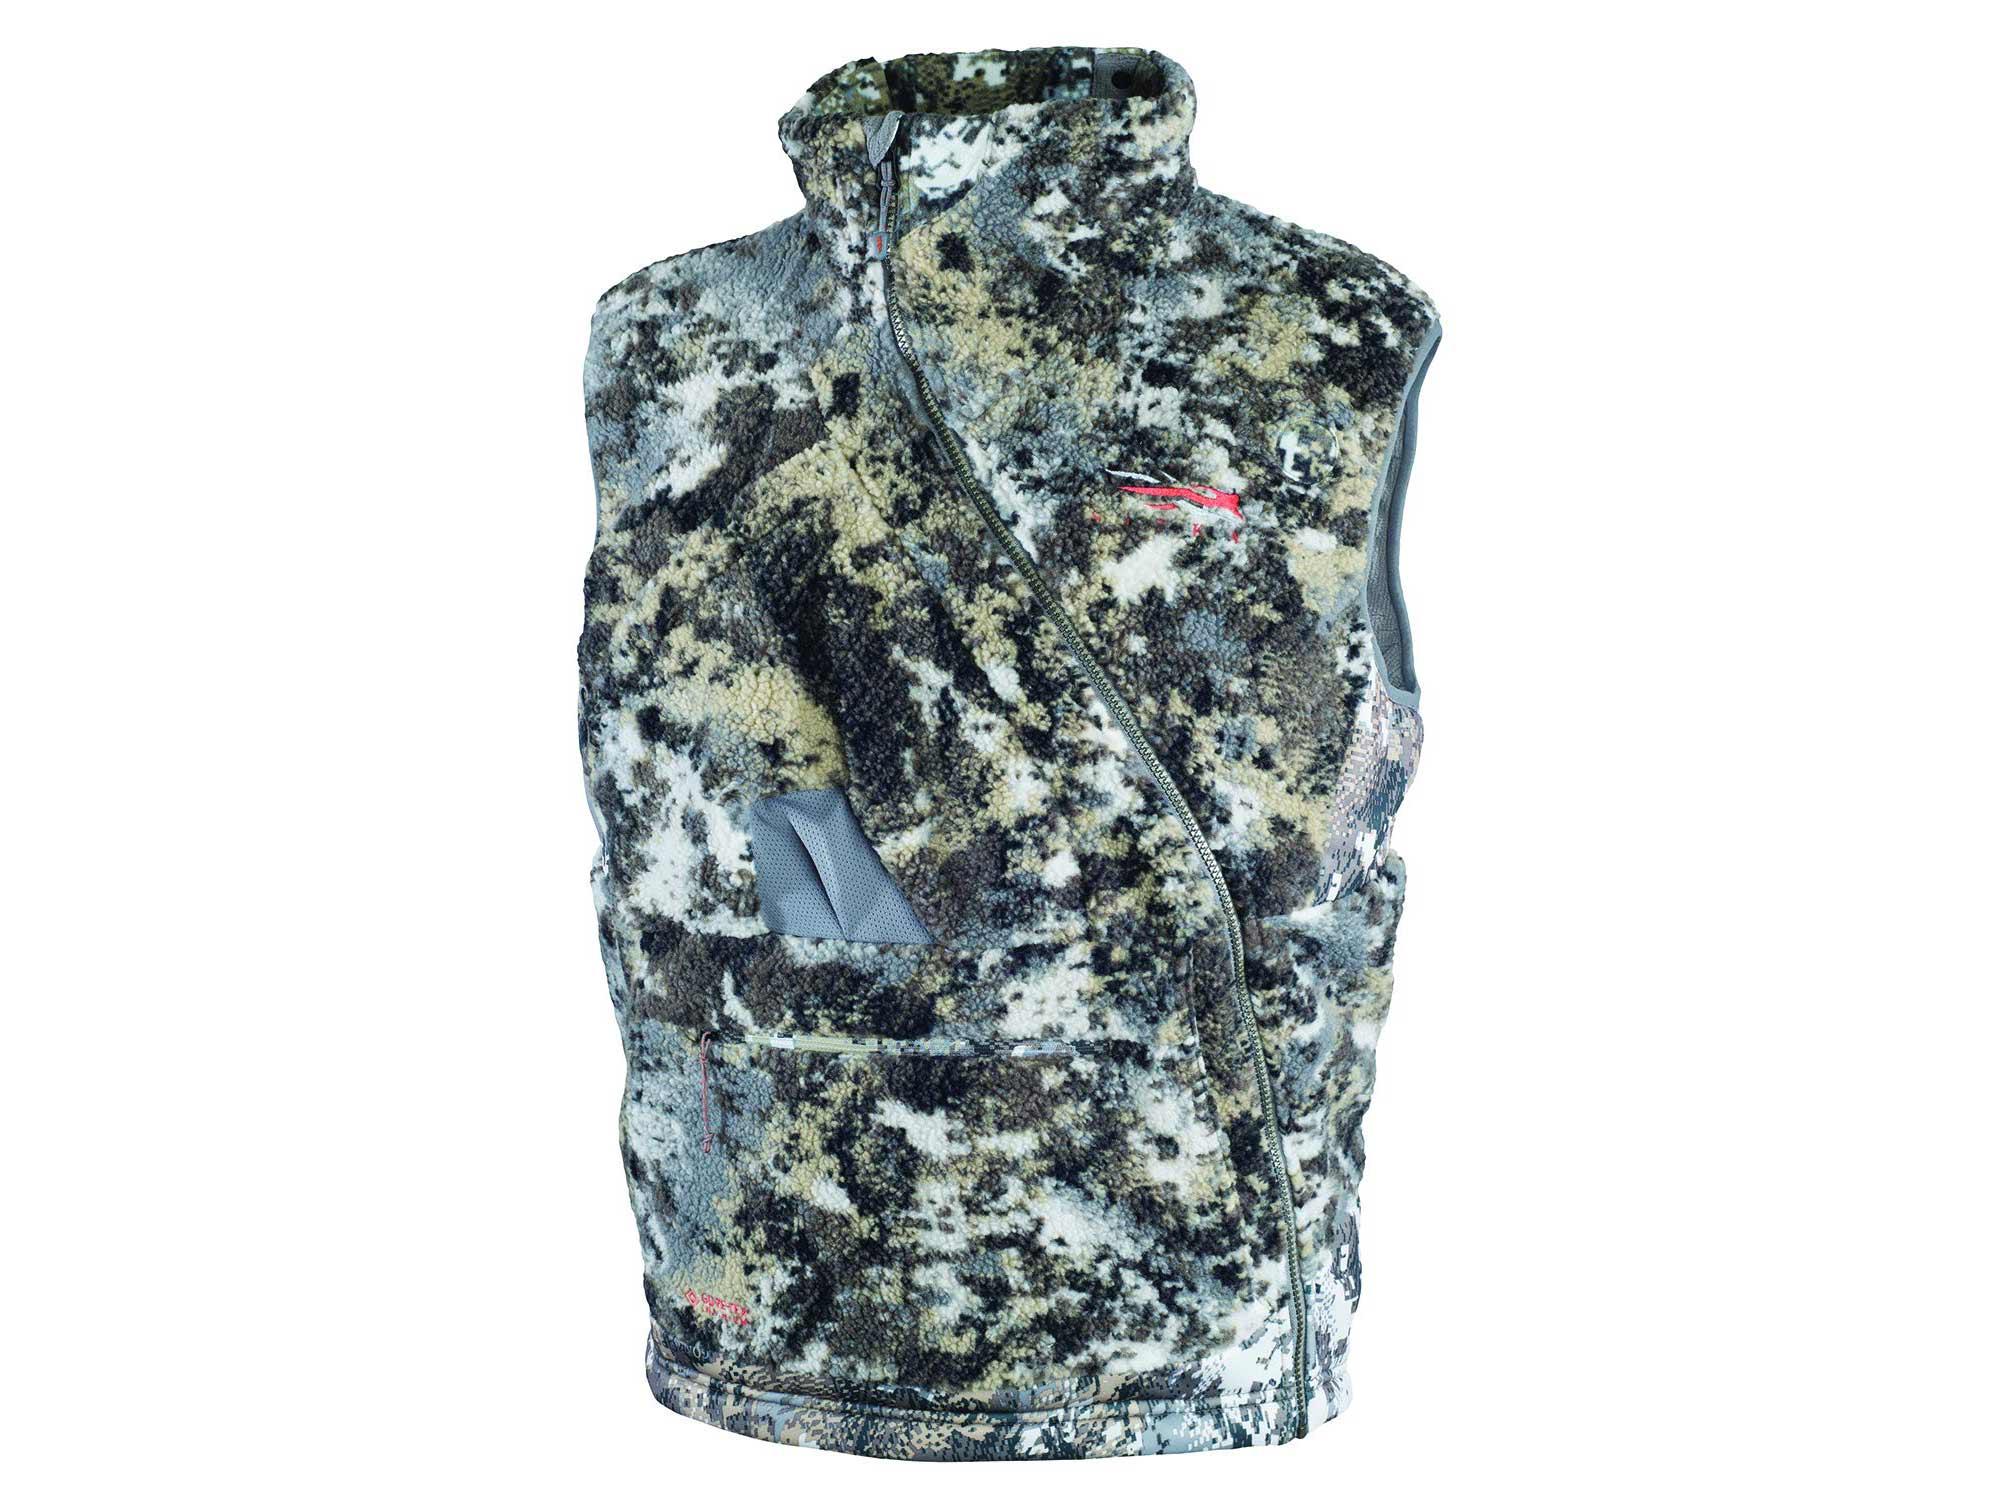 SITKA Men's Quiet Insulated Hunting Fanatic Vest